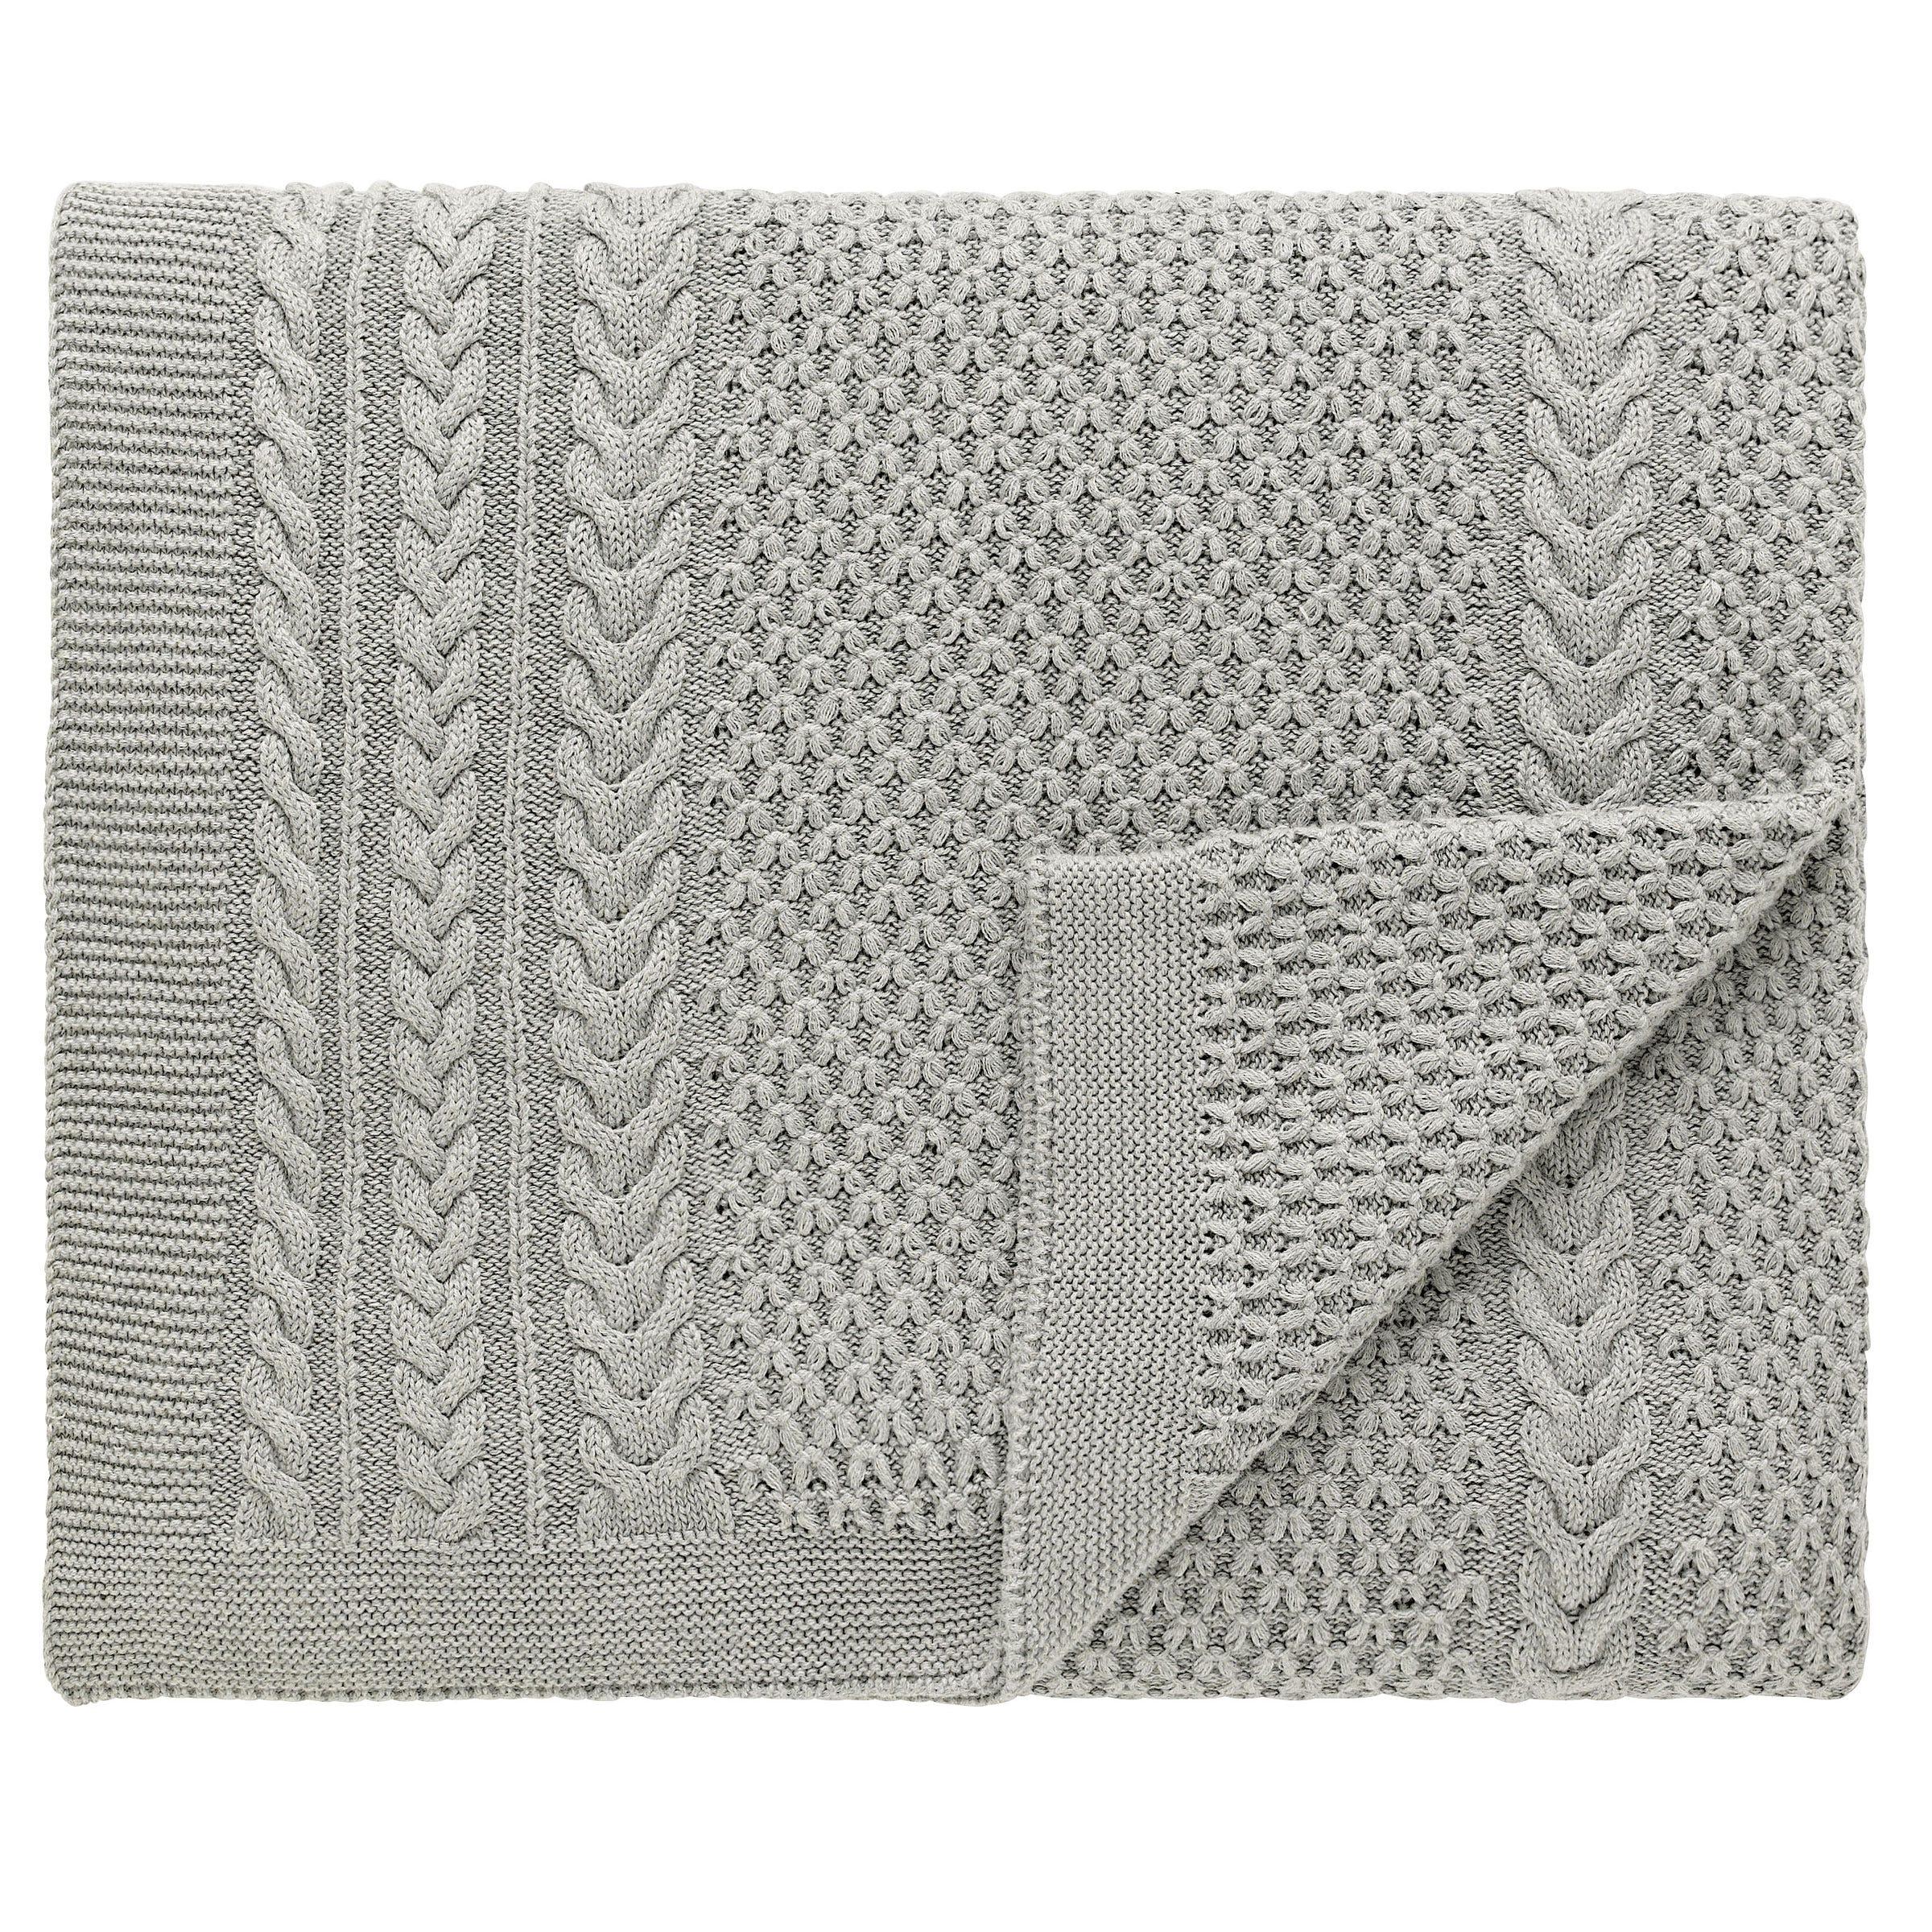 Sanderson Bedding Simi Knitted Throw Grey